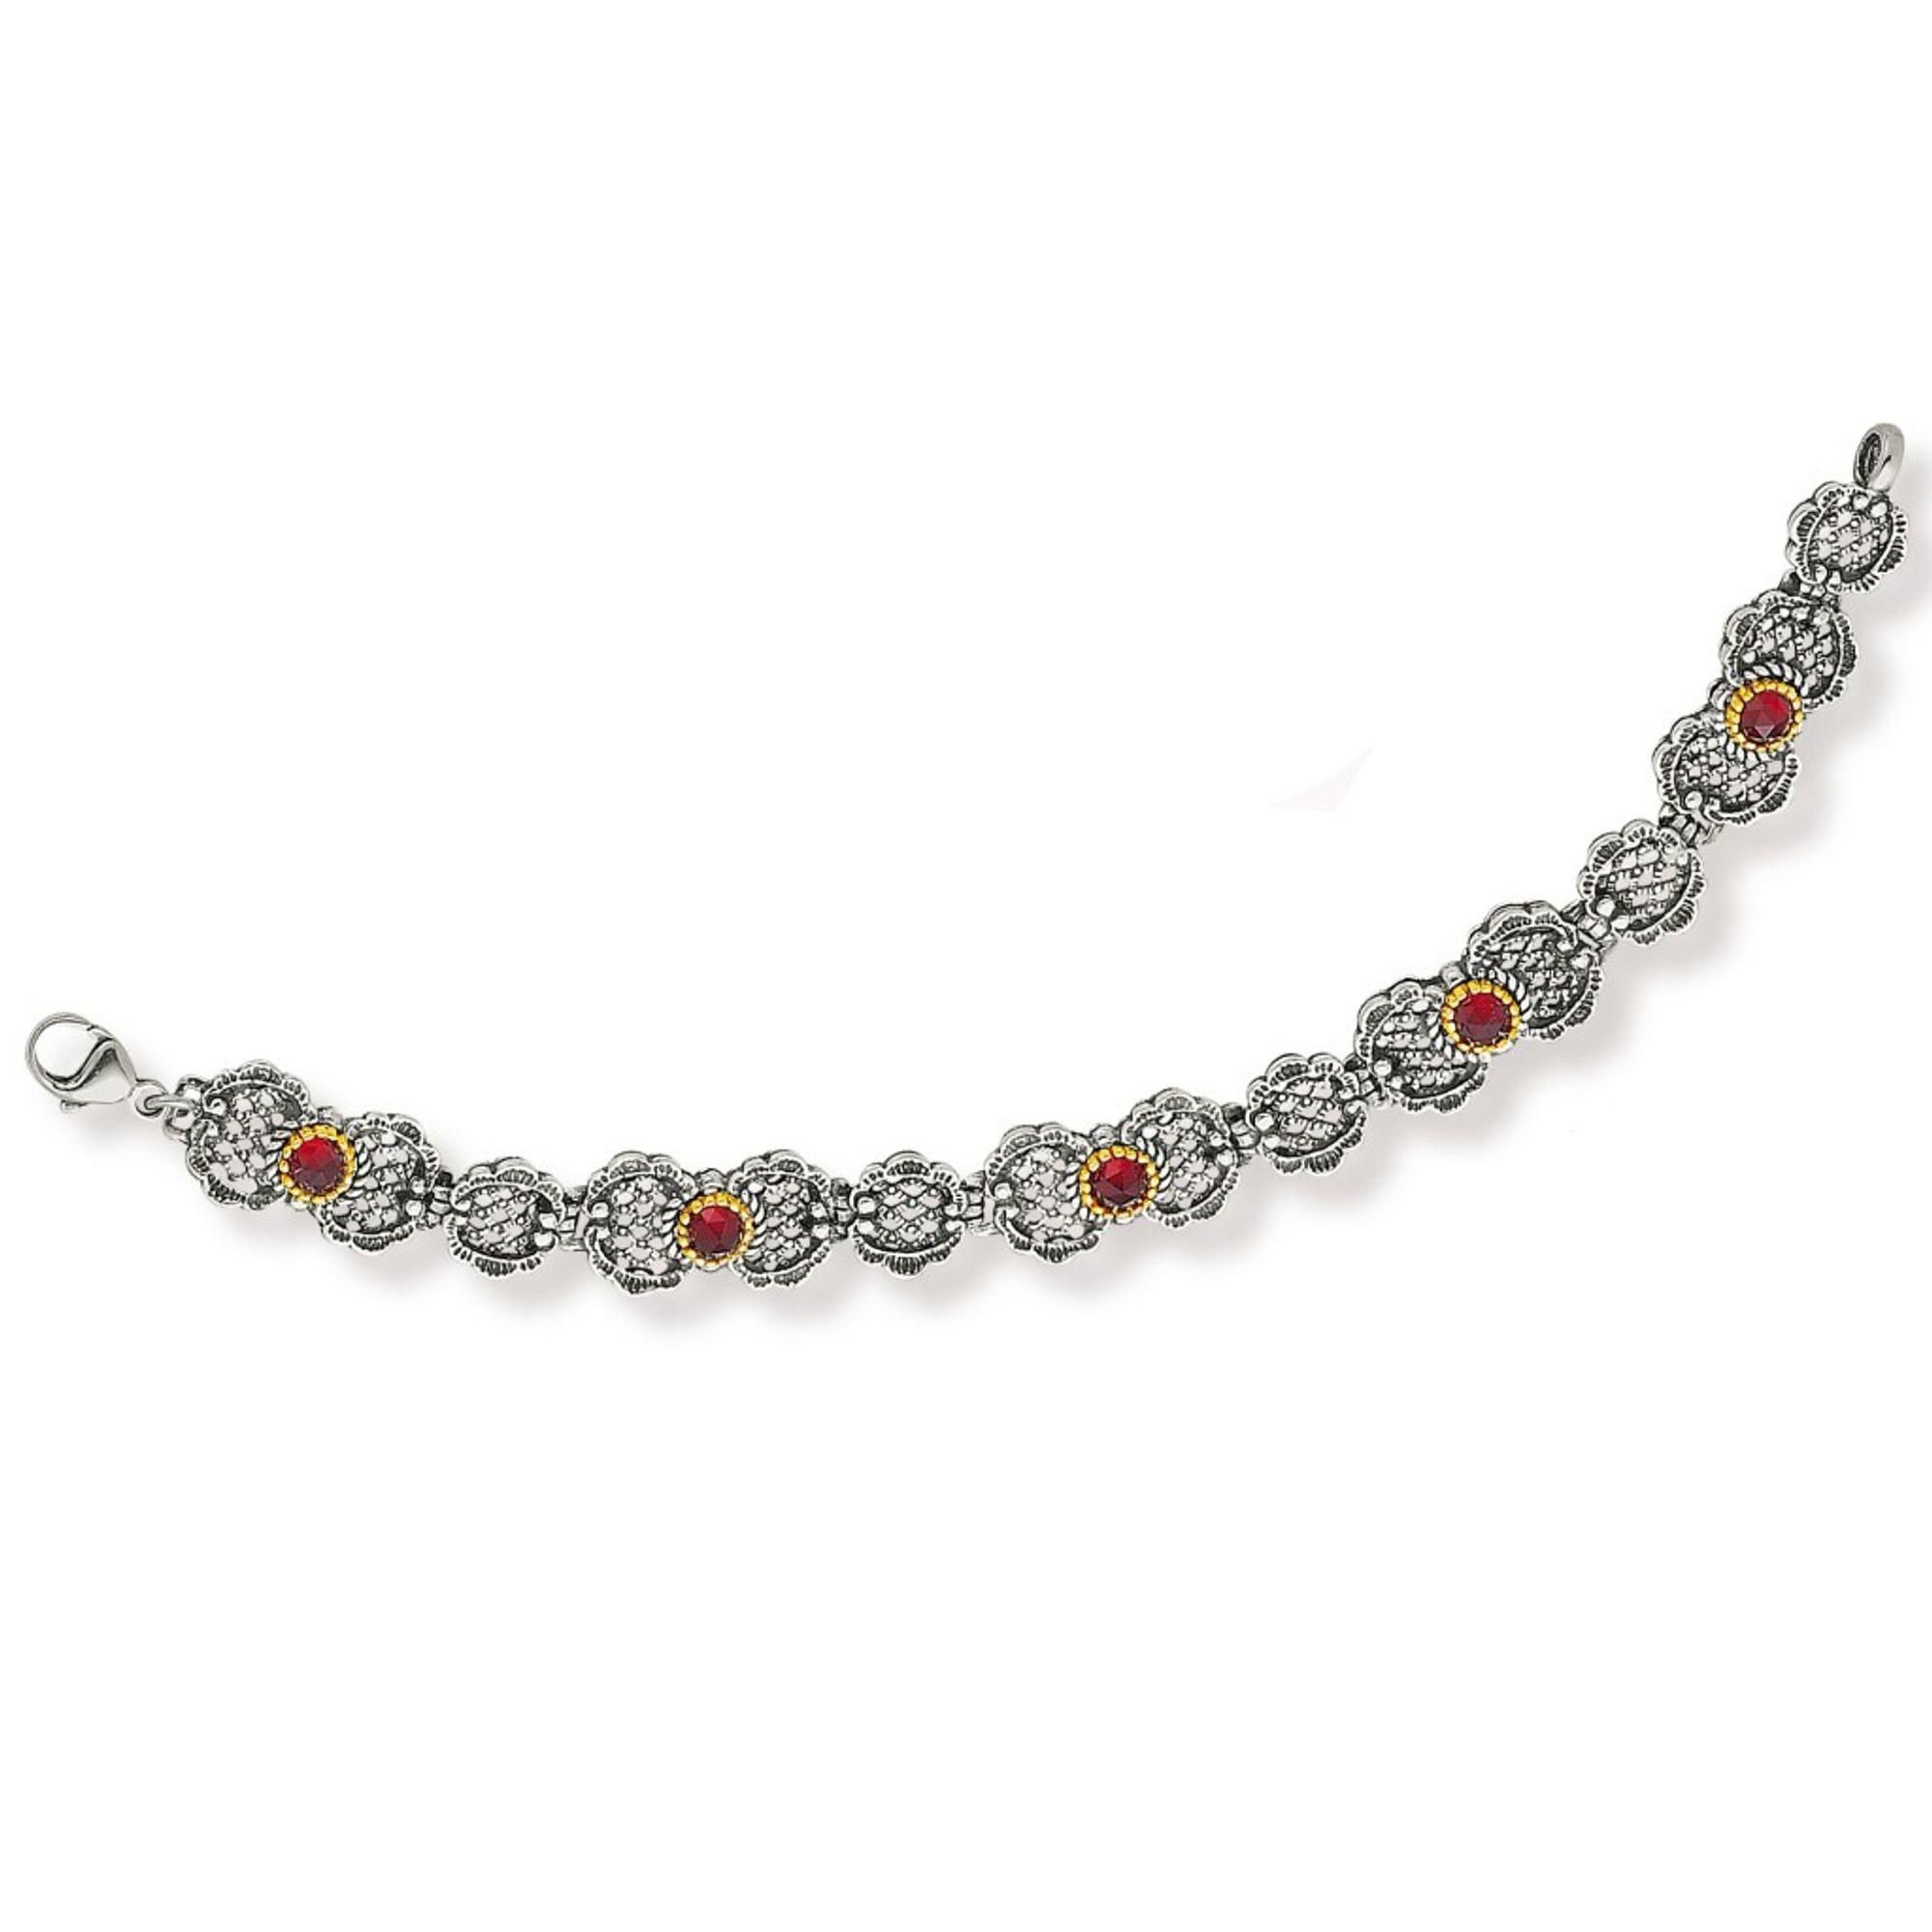 Tom Hill 41.9012 Damen Armband Silber bicolor Granat rot 18 cm